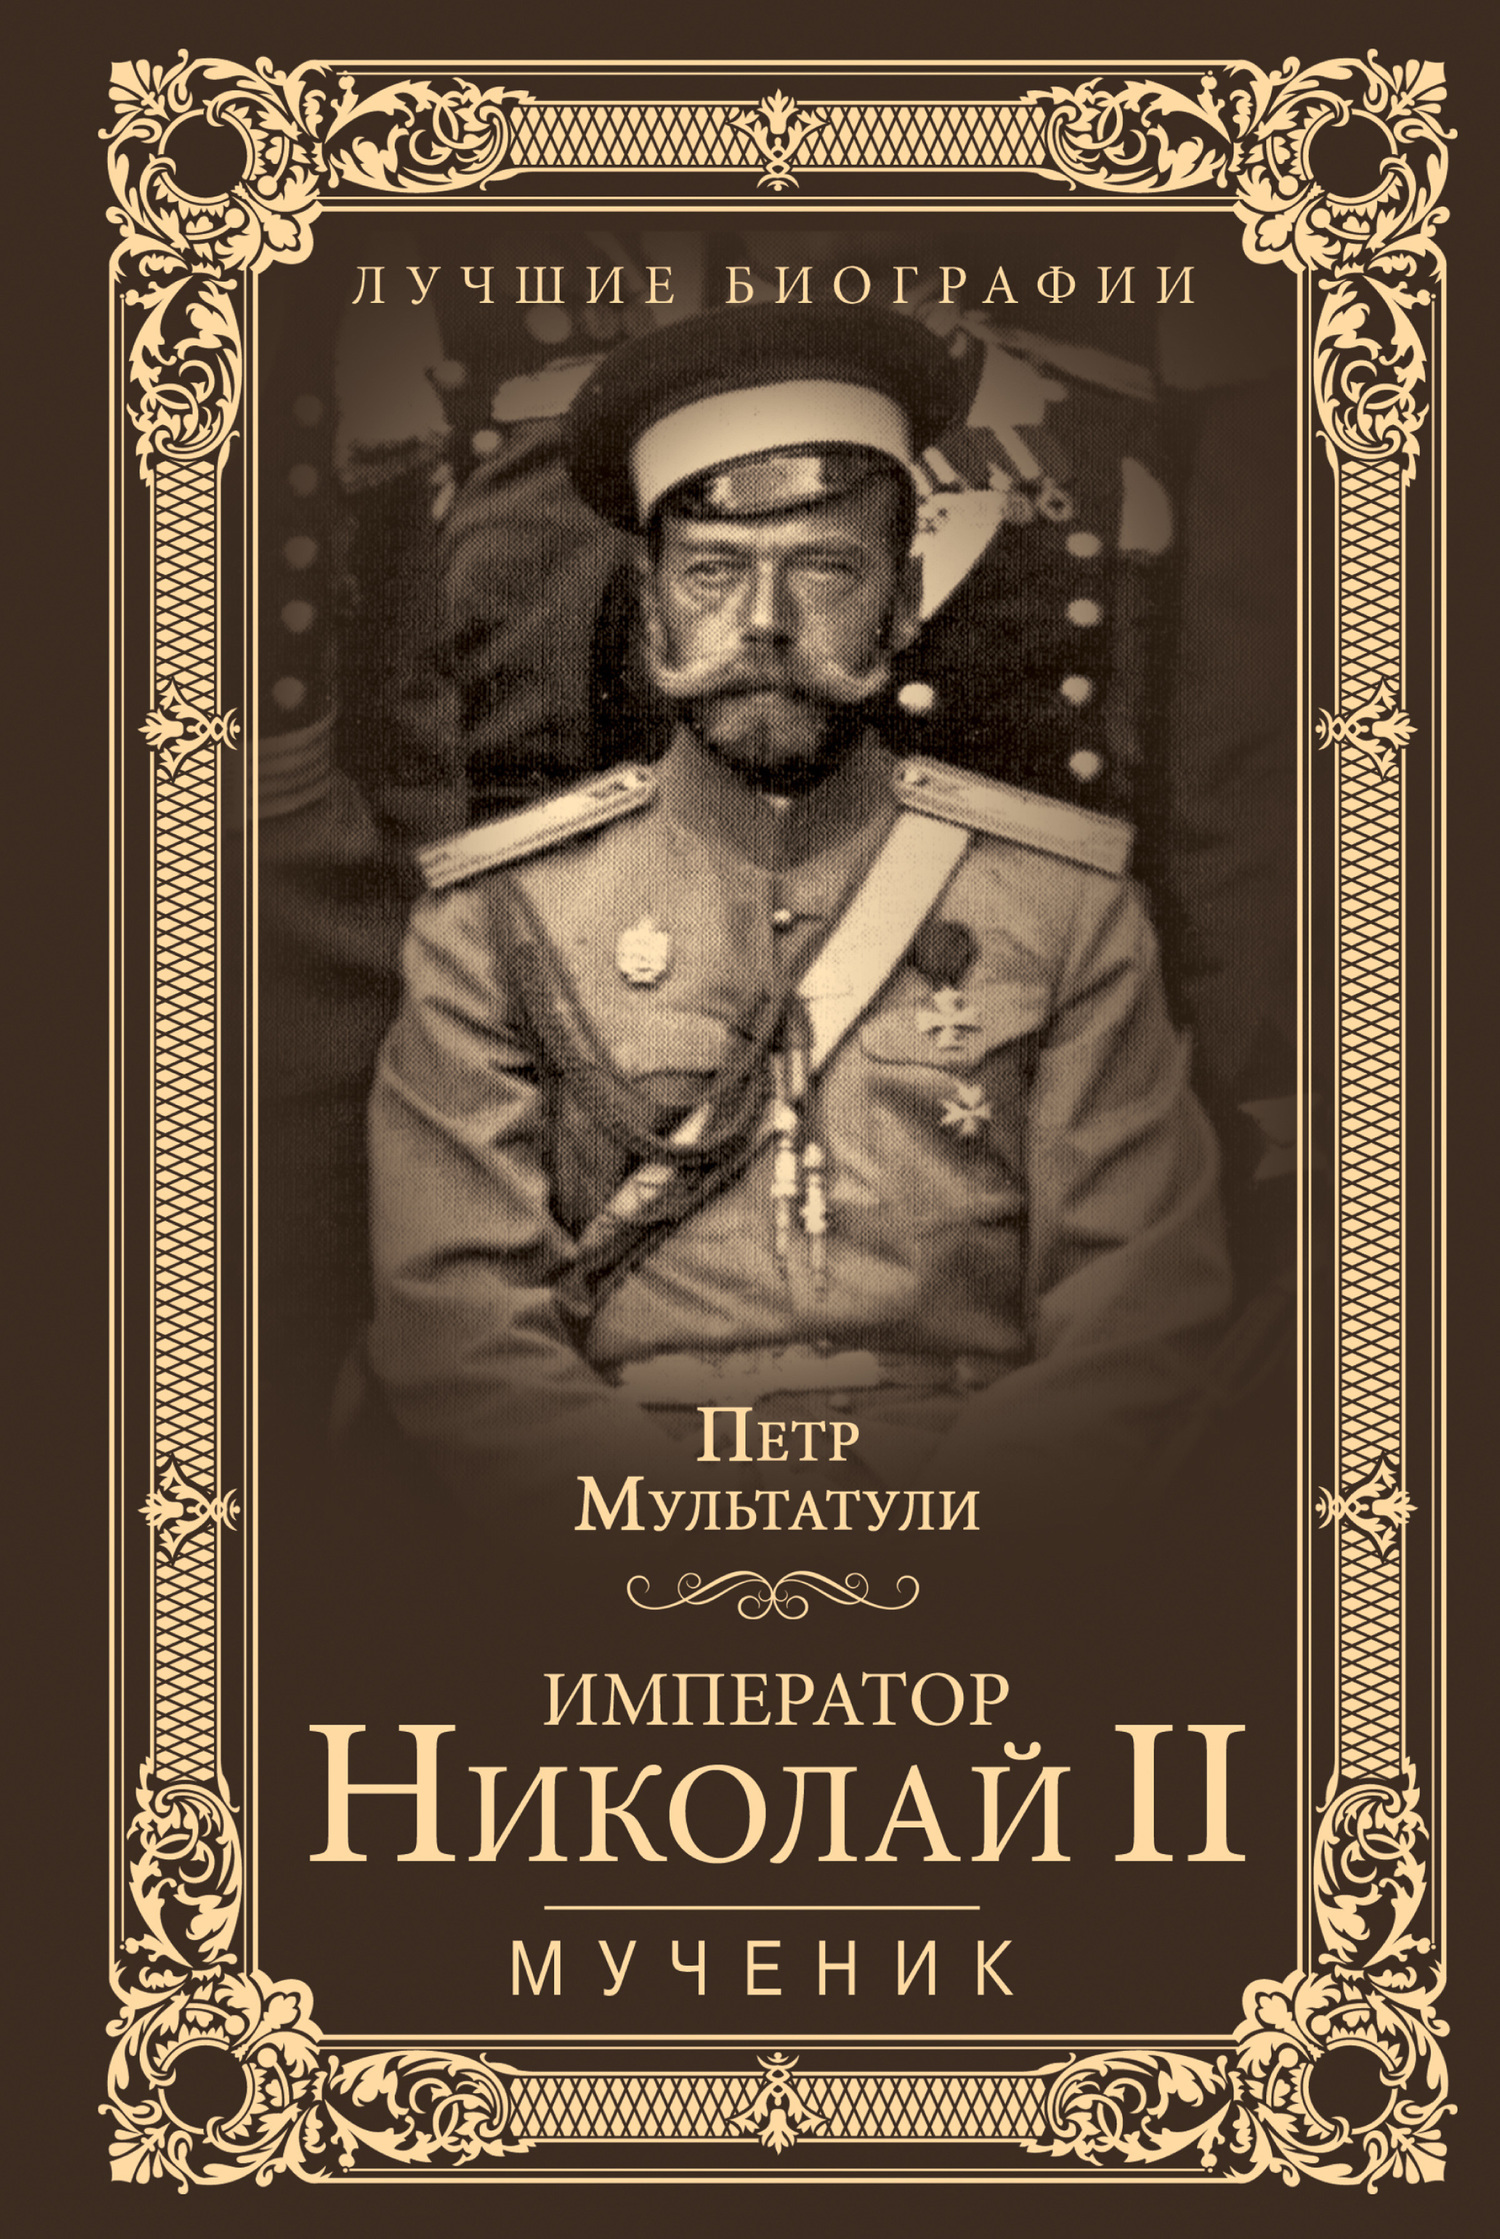 Петр Мультатули - Император Николай II. Мученик